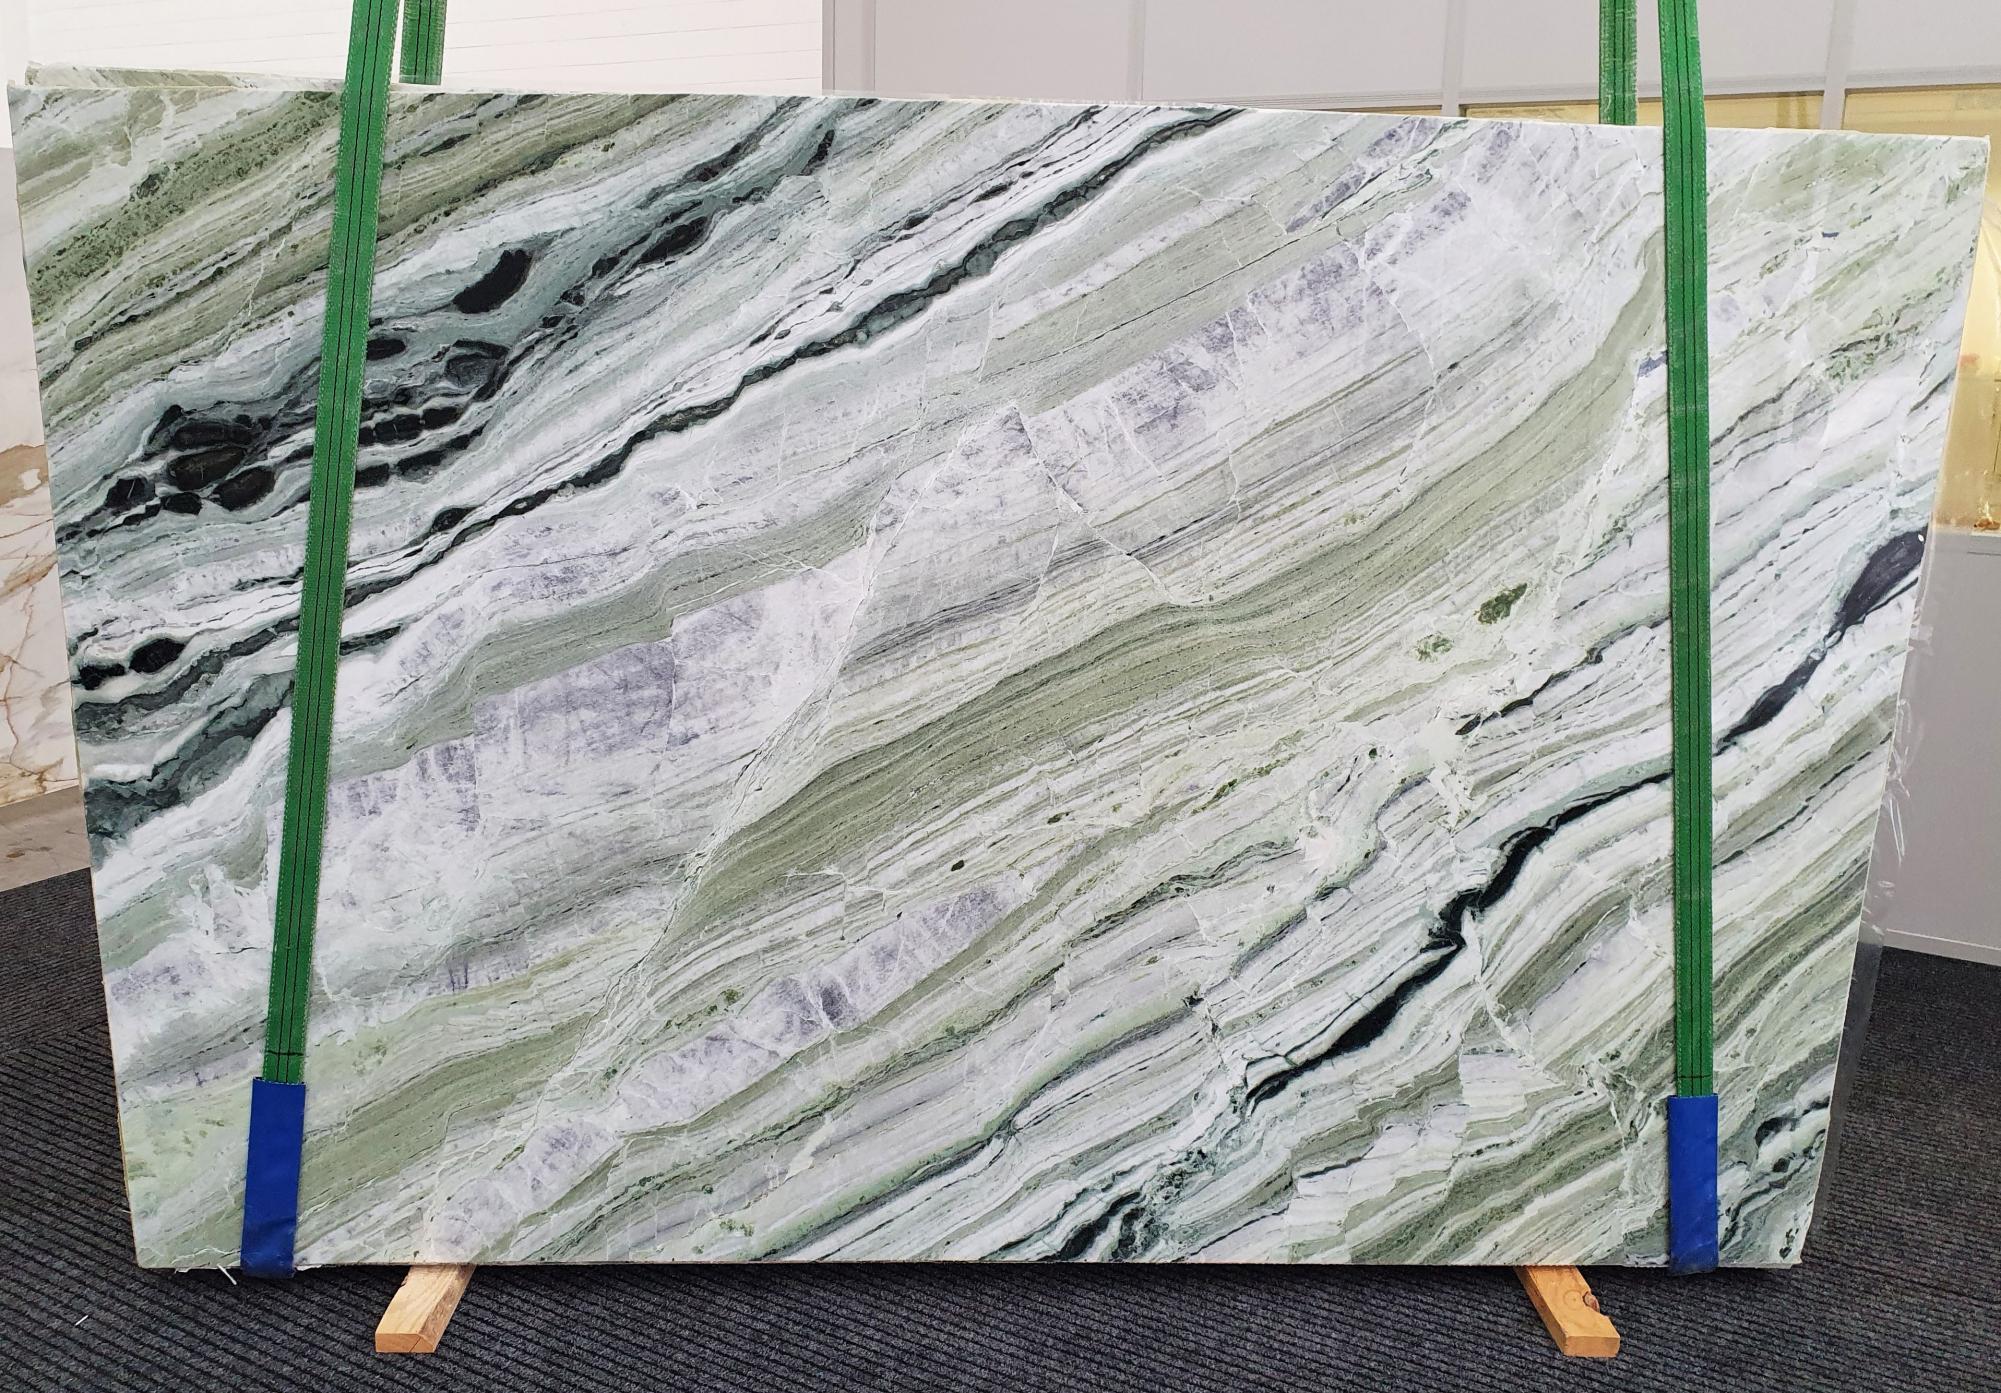 GREEN BEAUTY polierte Unmaßplatten 1452 aus Natur Marmor , Slab #10: Lieferung Veneto, Italien